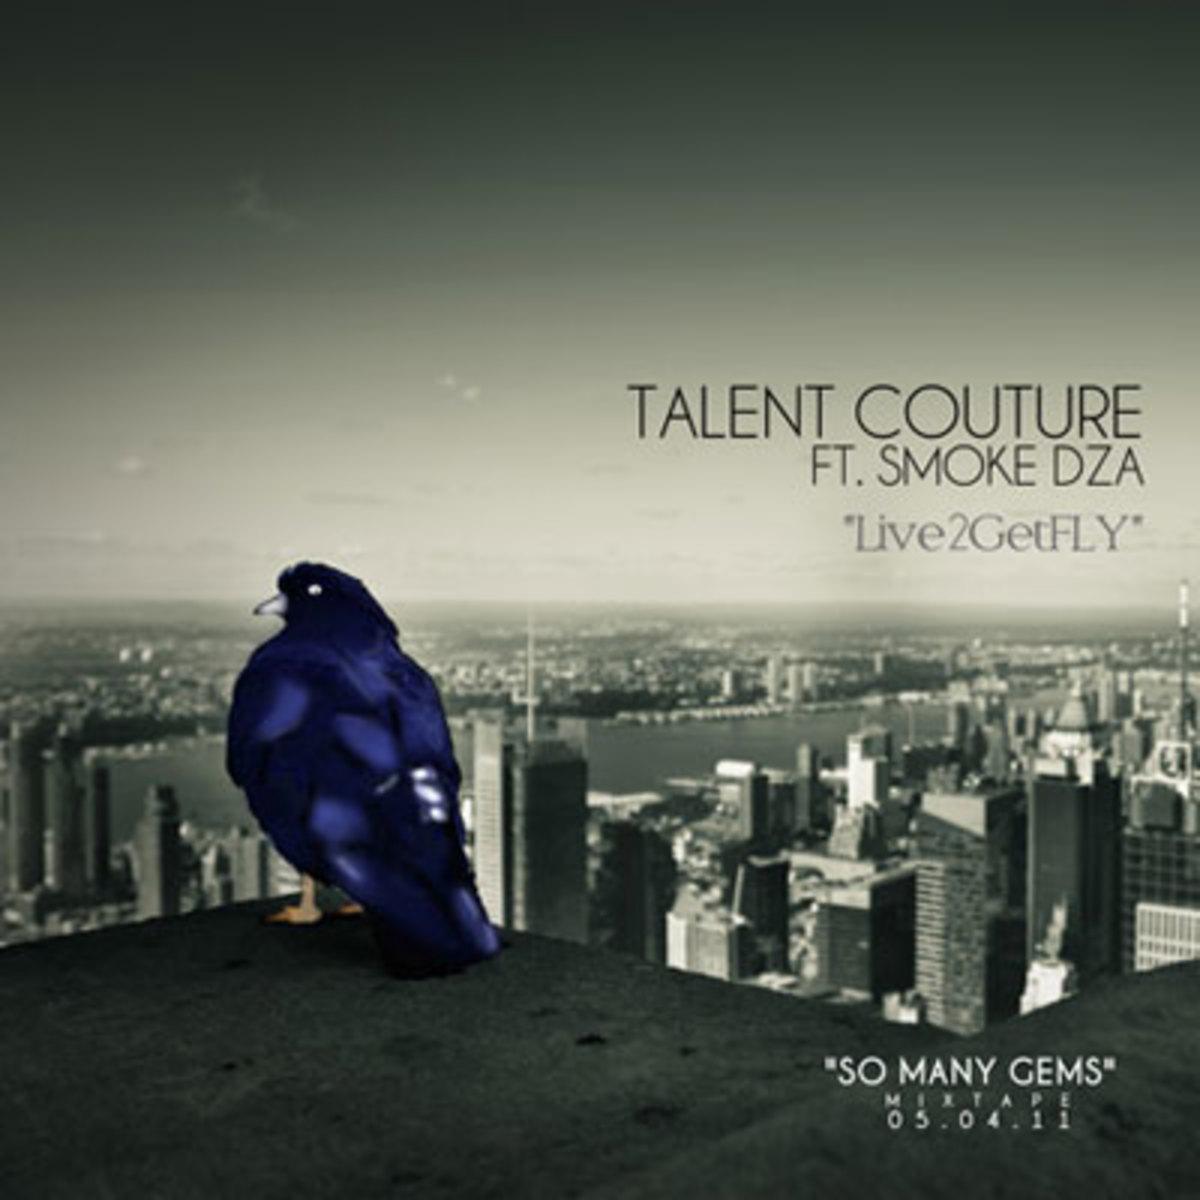 talentcouture-live2getfly.jpg